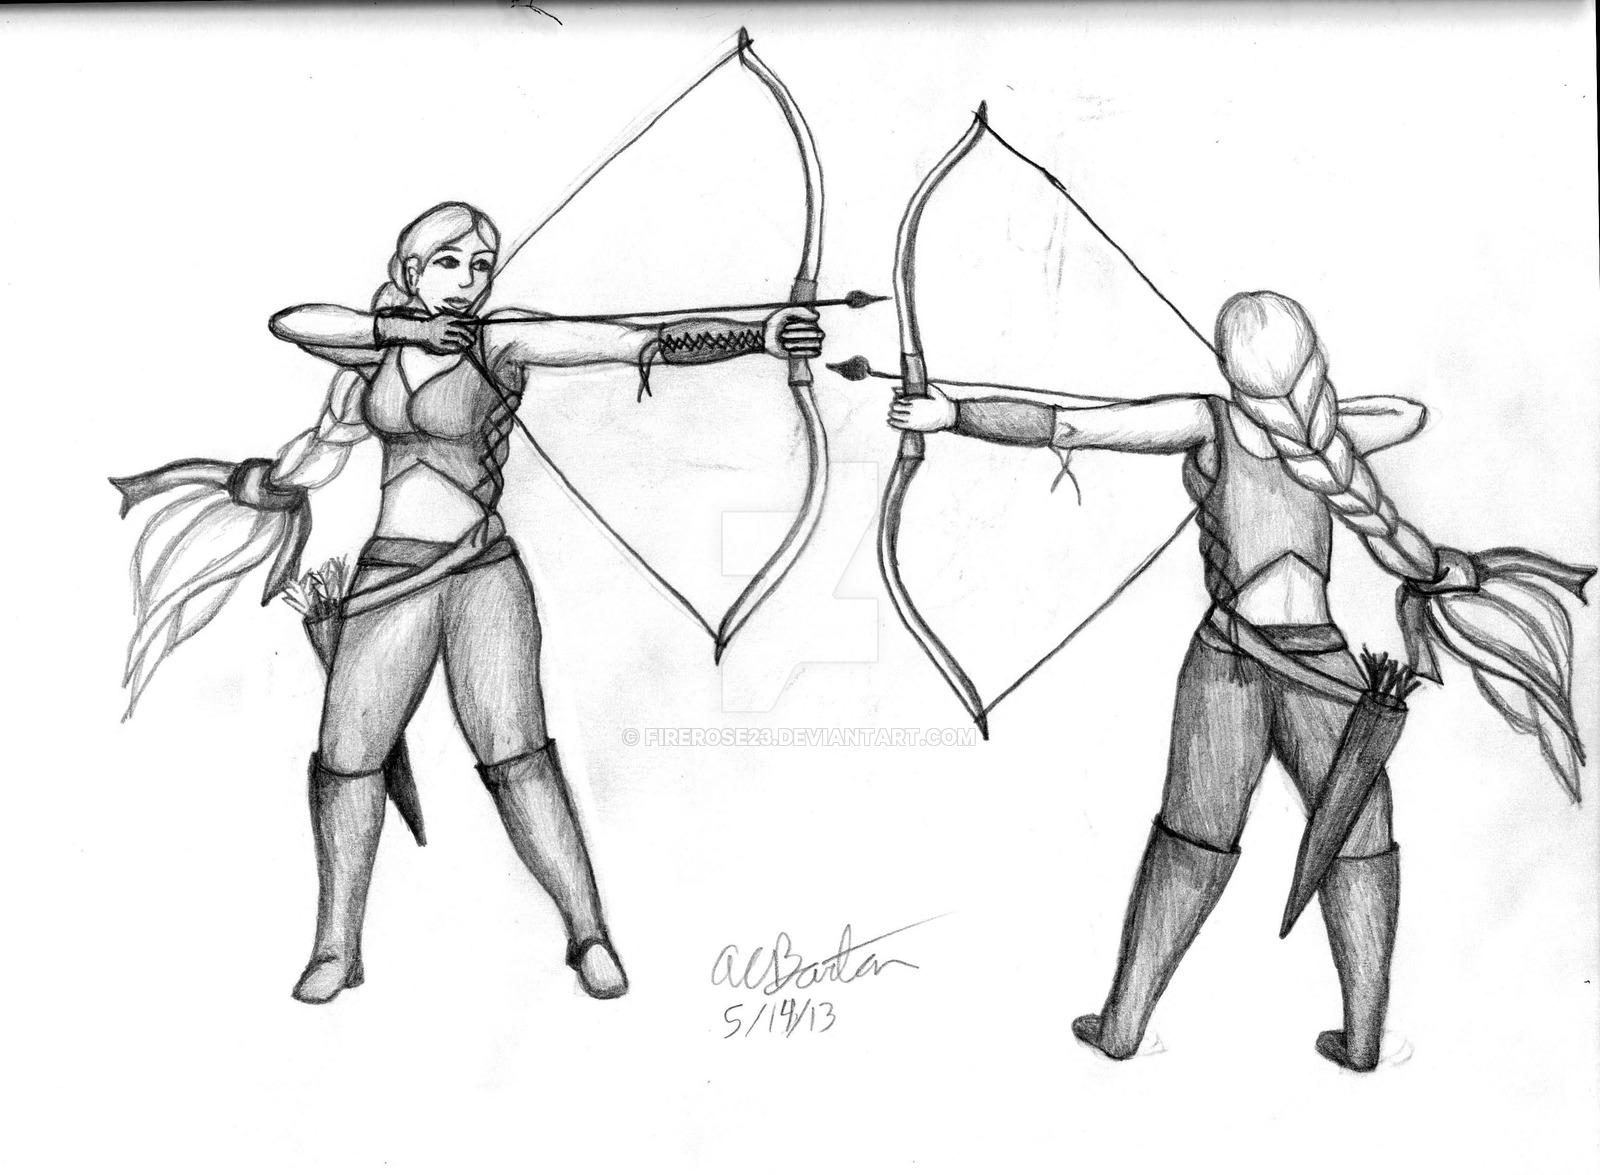 1600x1175 Archery Girl 001 By Firerose23